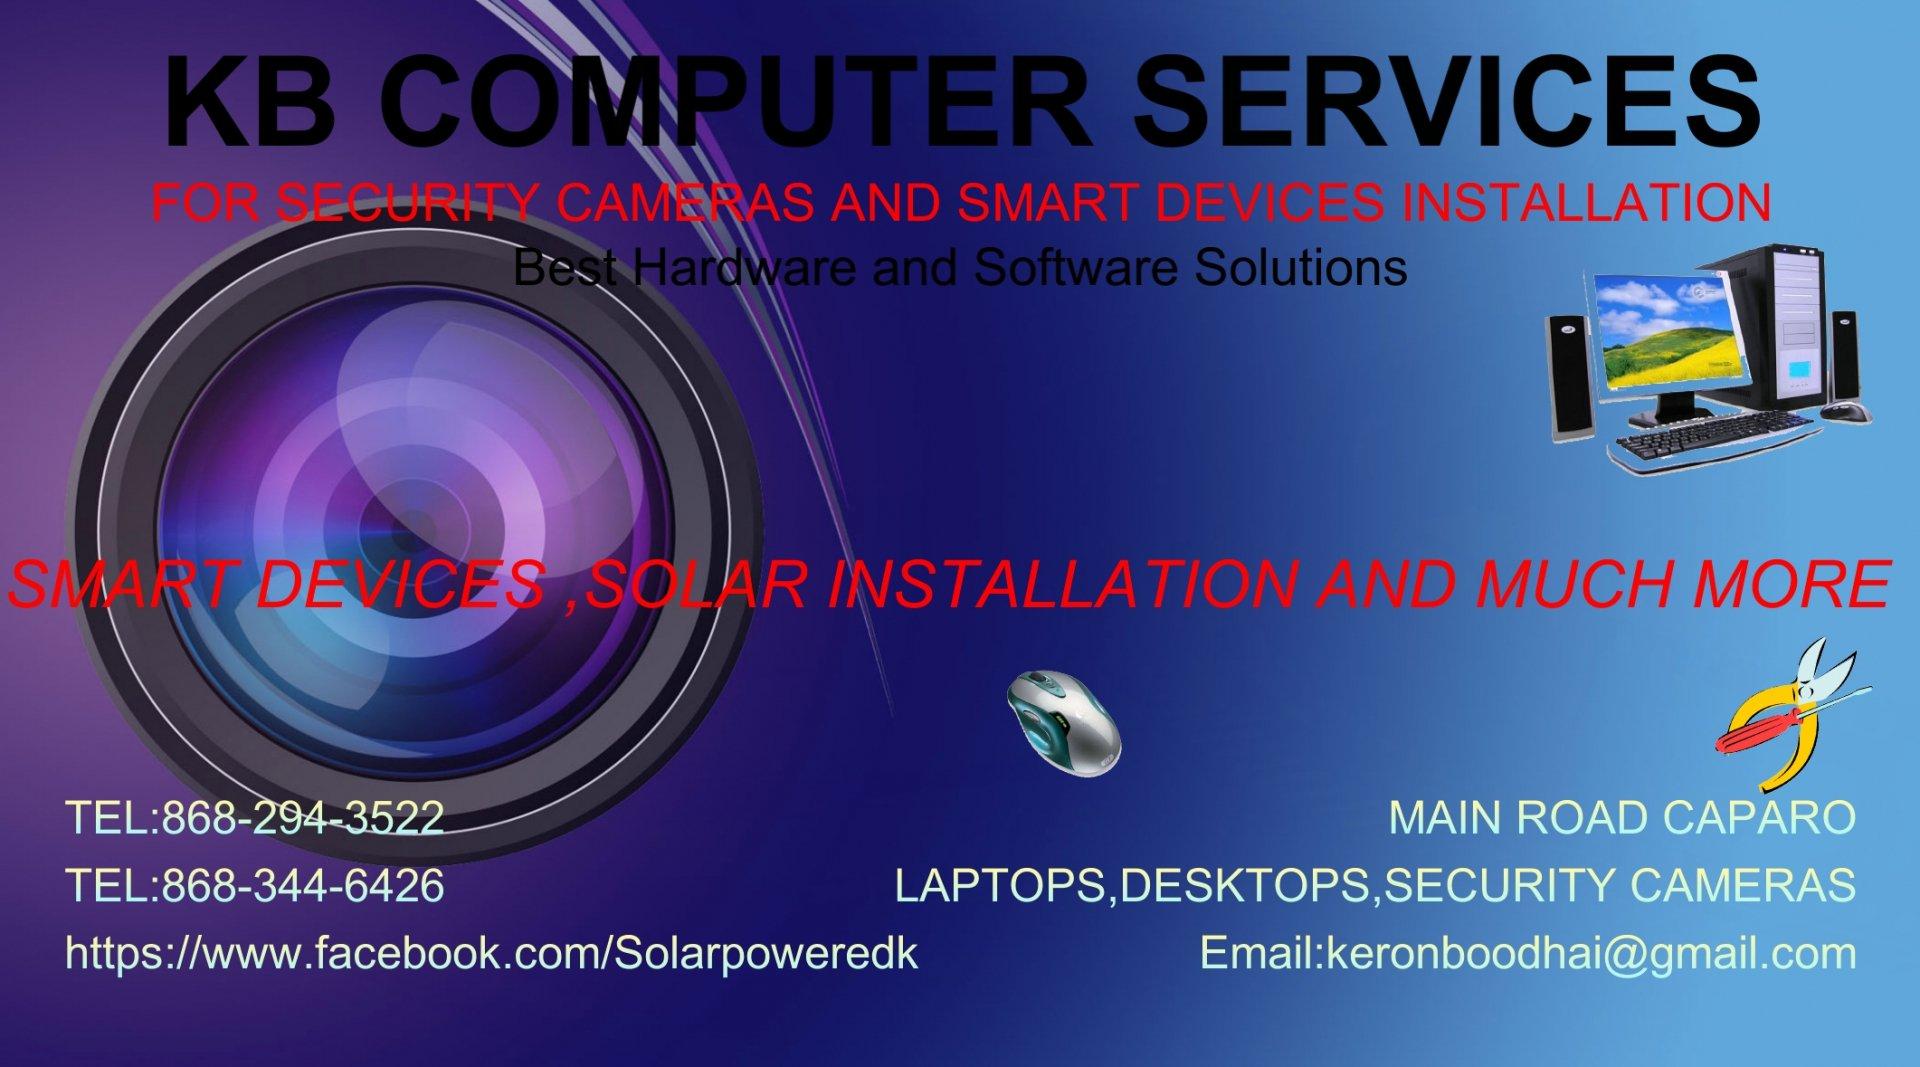 KB Computer Services